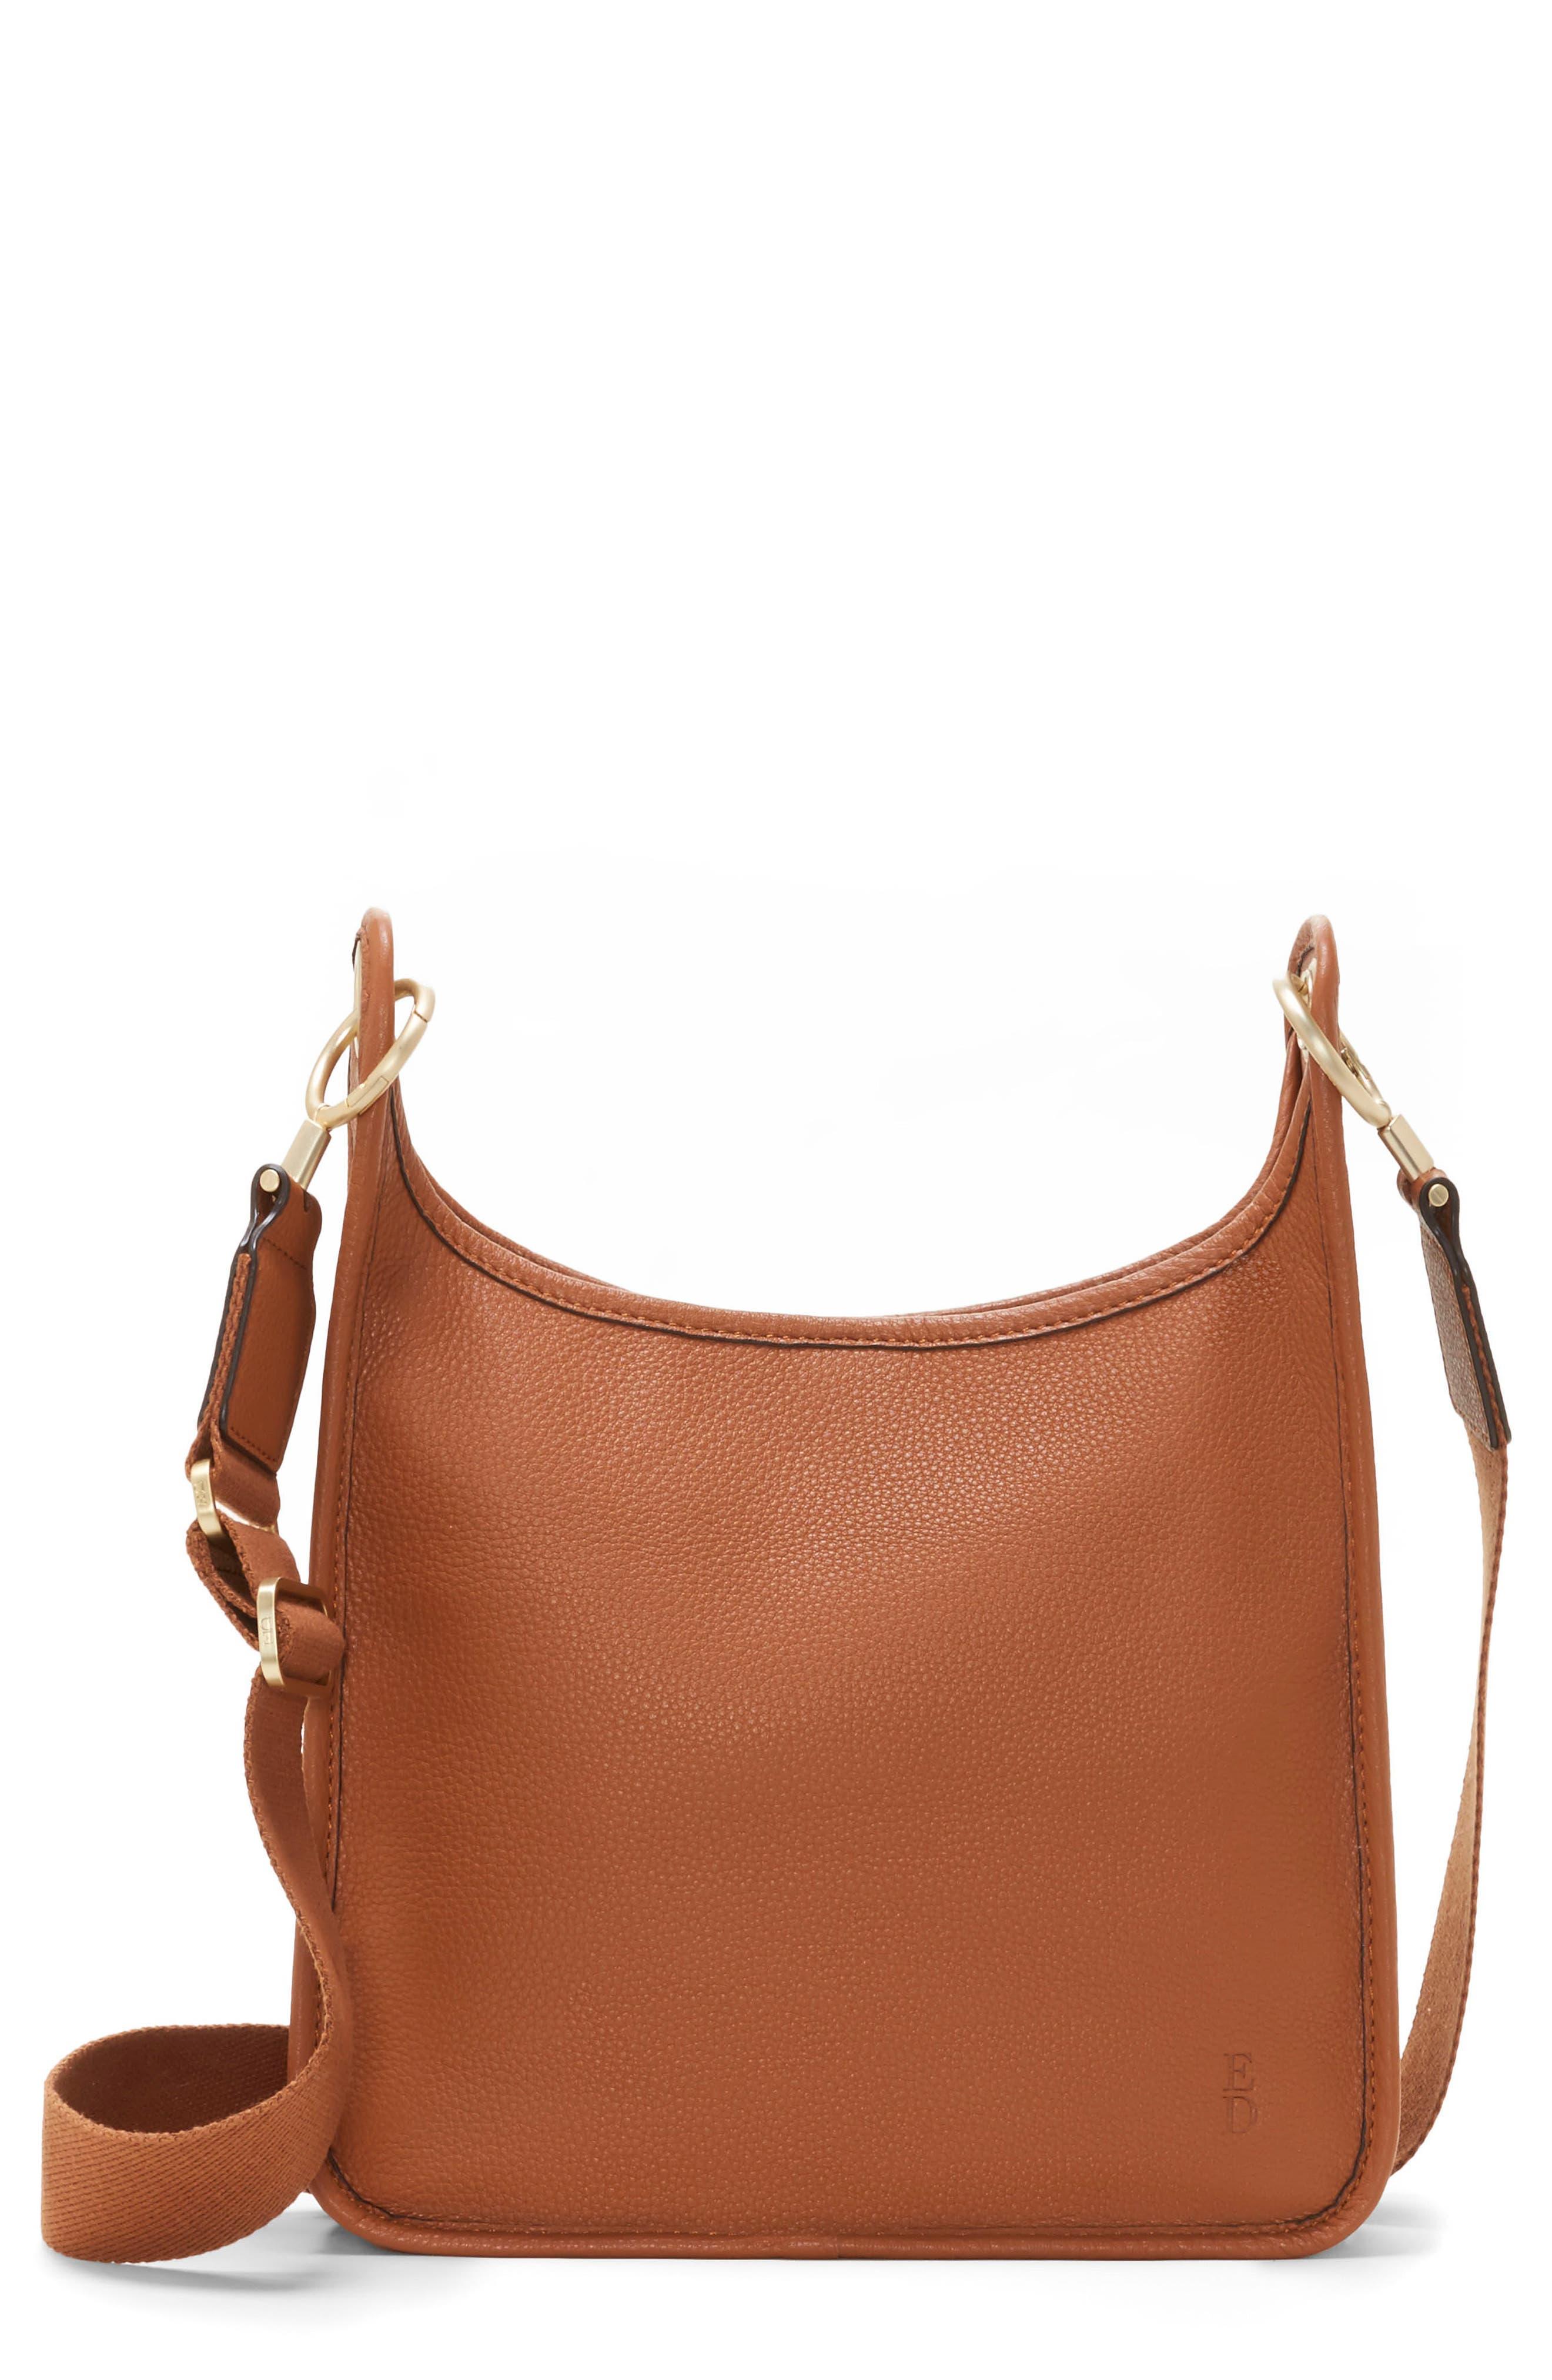 Leather Crossbody Bag,                             Main thumbnail 1, color,                             201